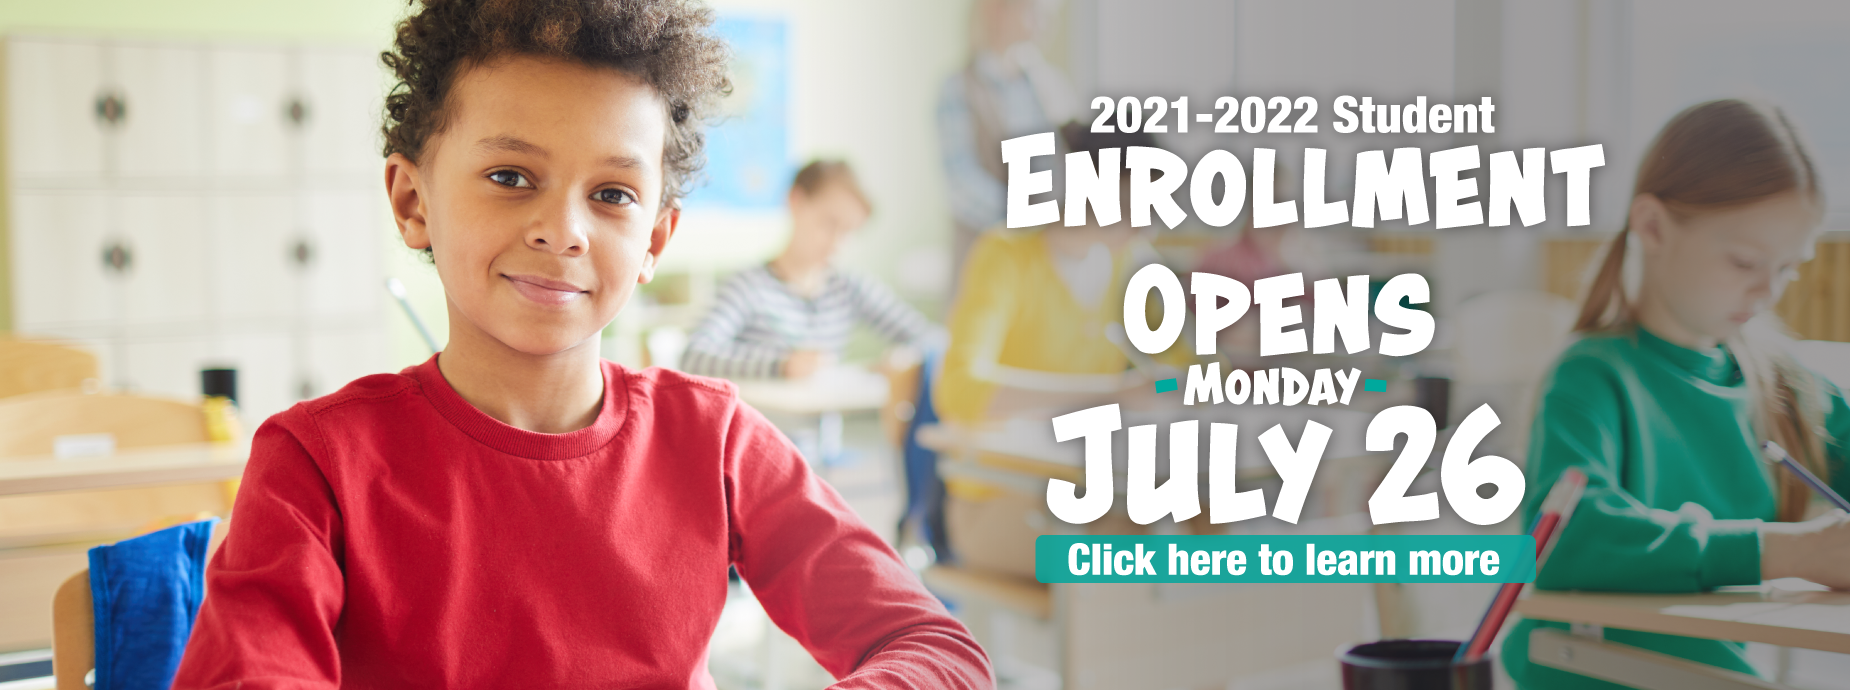 21-22 Enrollment Starts July 26th